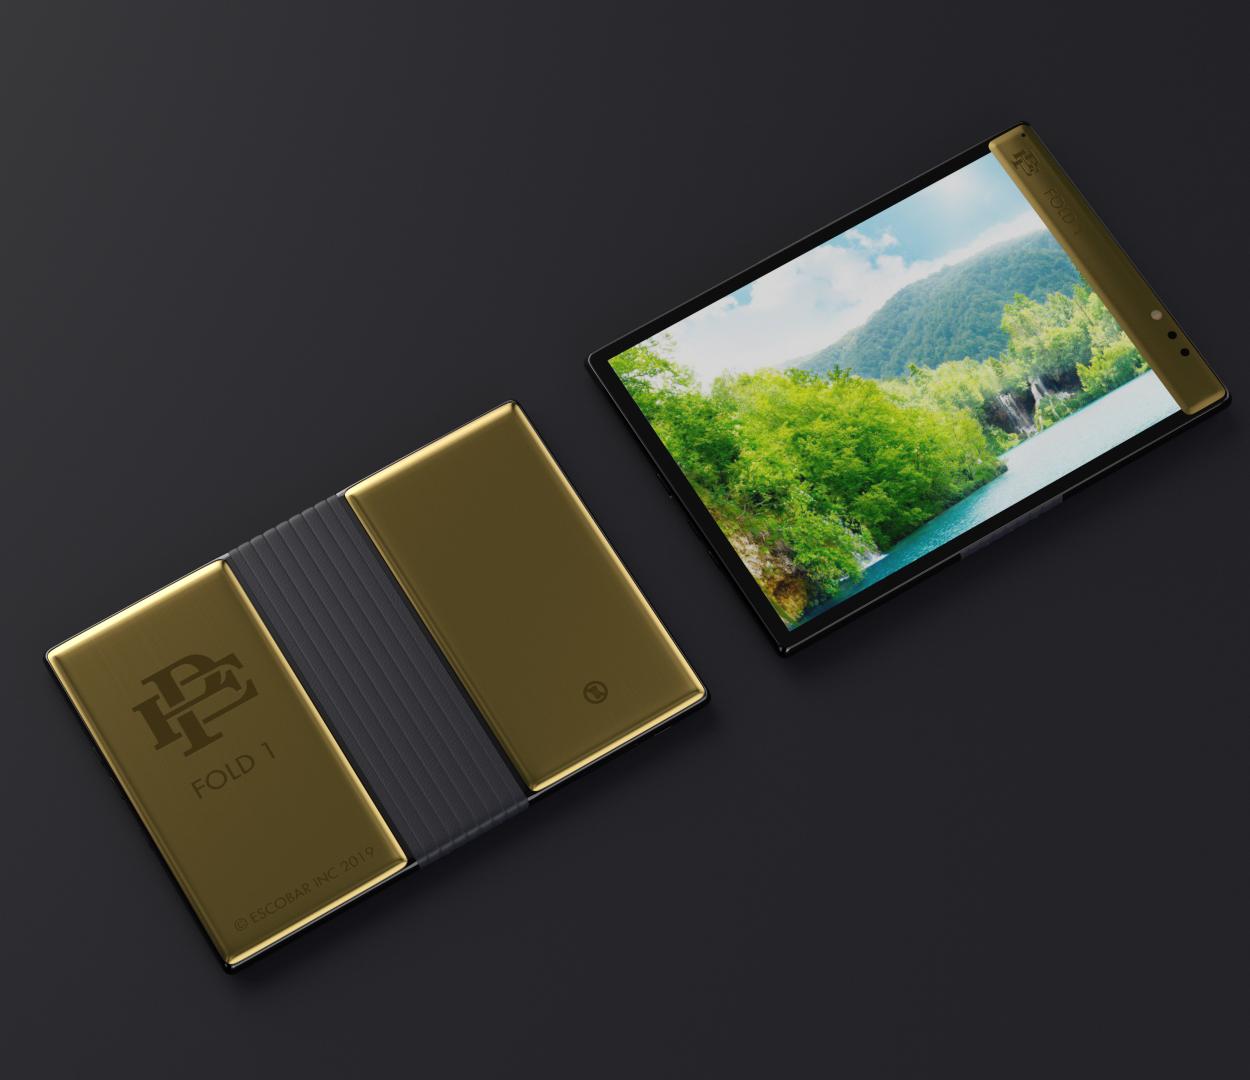 Escobar Fold 1 Foldable Phone